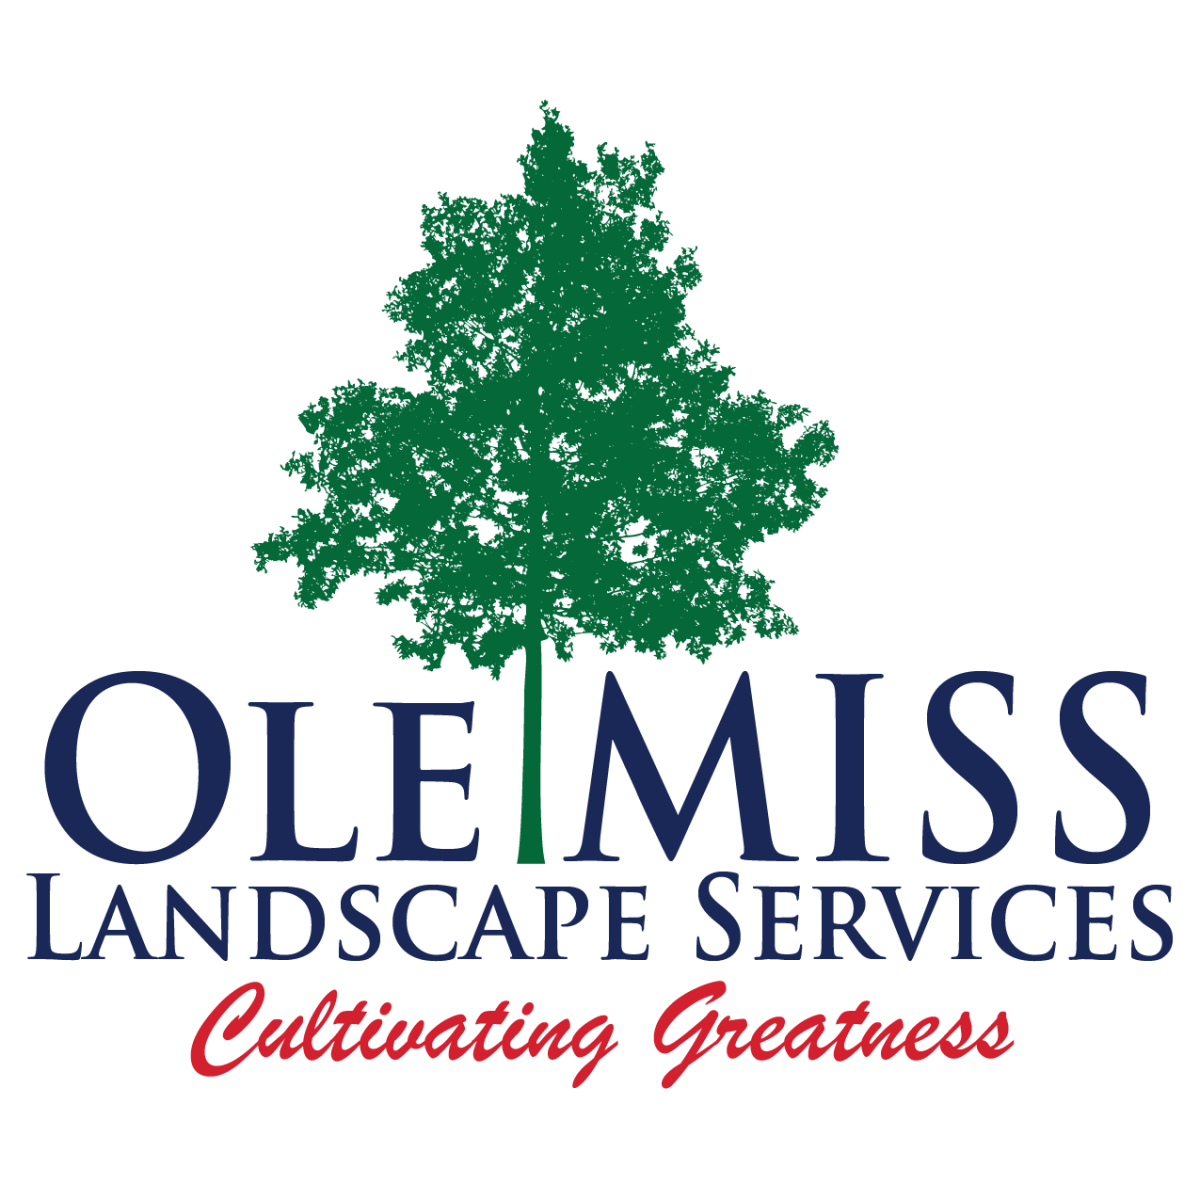 Ole Miss Landscape Services Logo